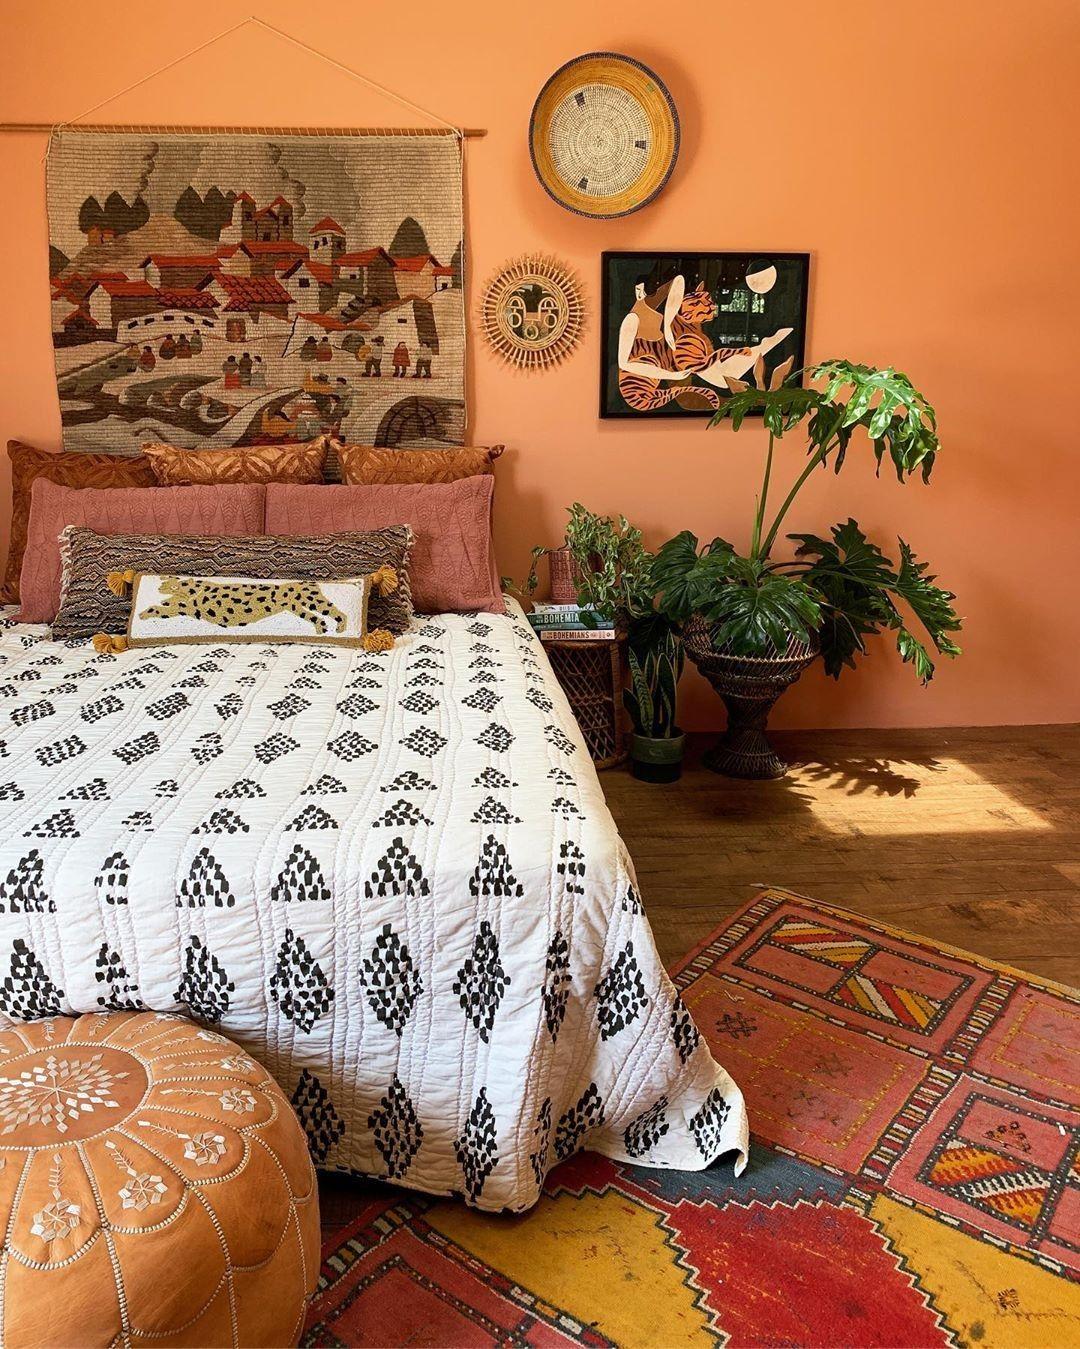 Boho style ideas for bedroom decors home decor bedroom